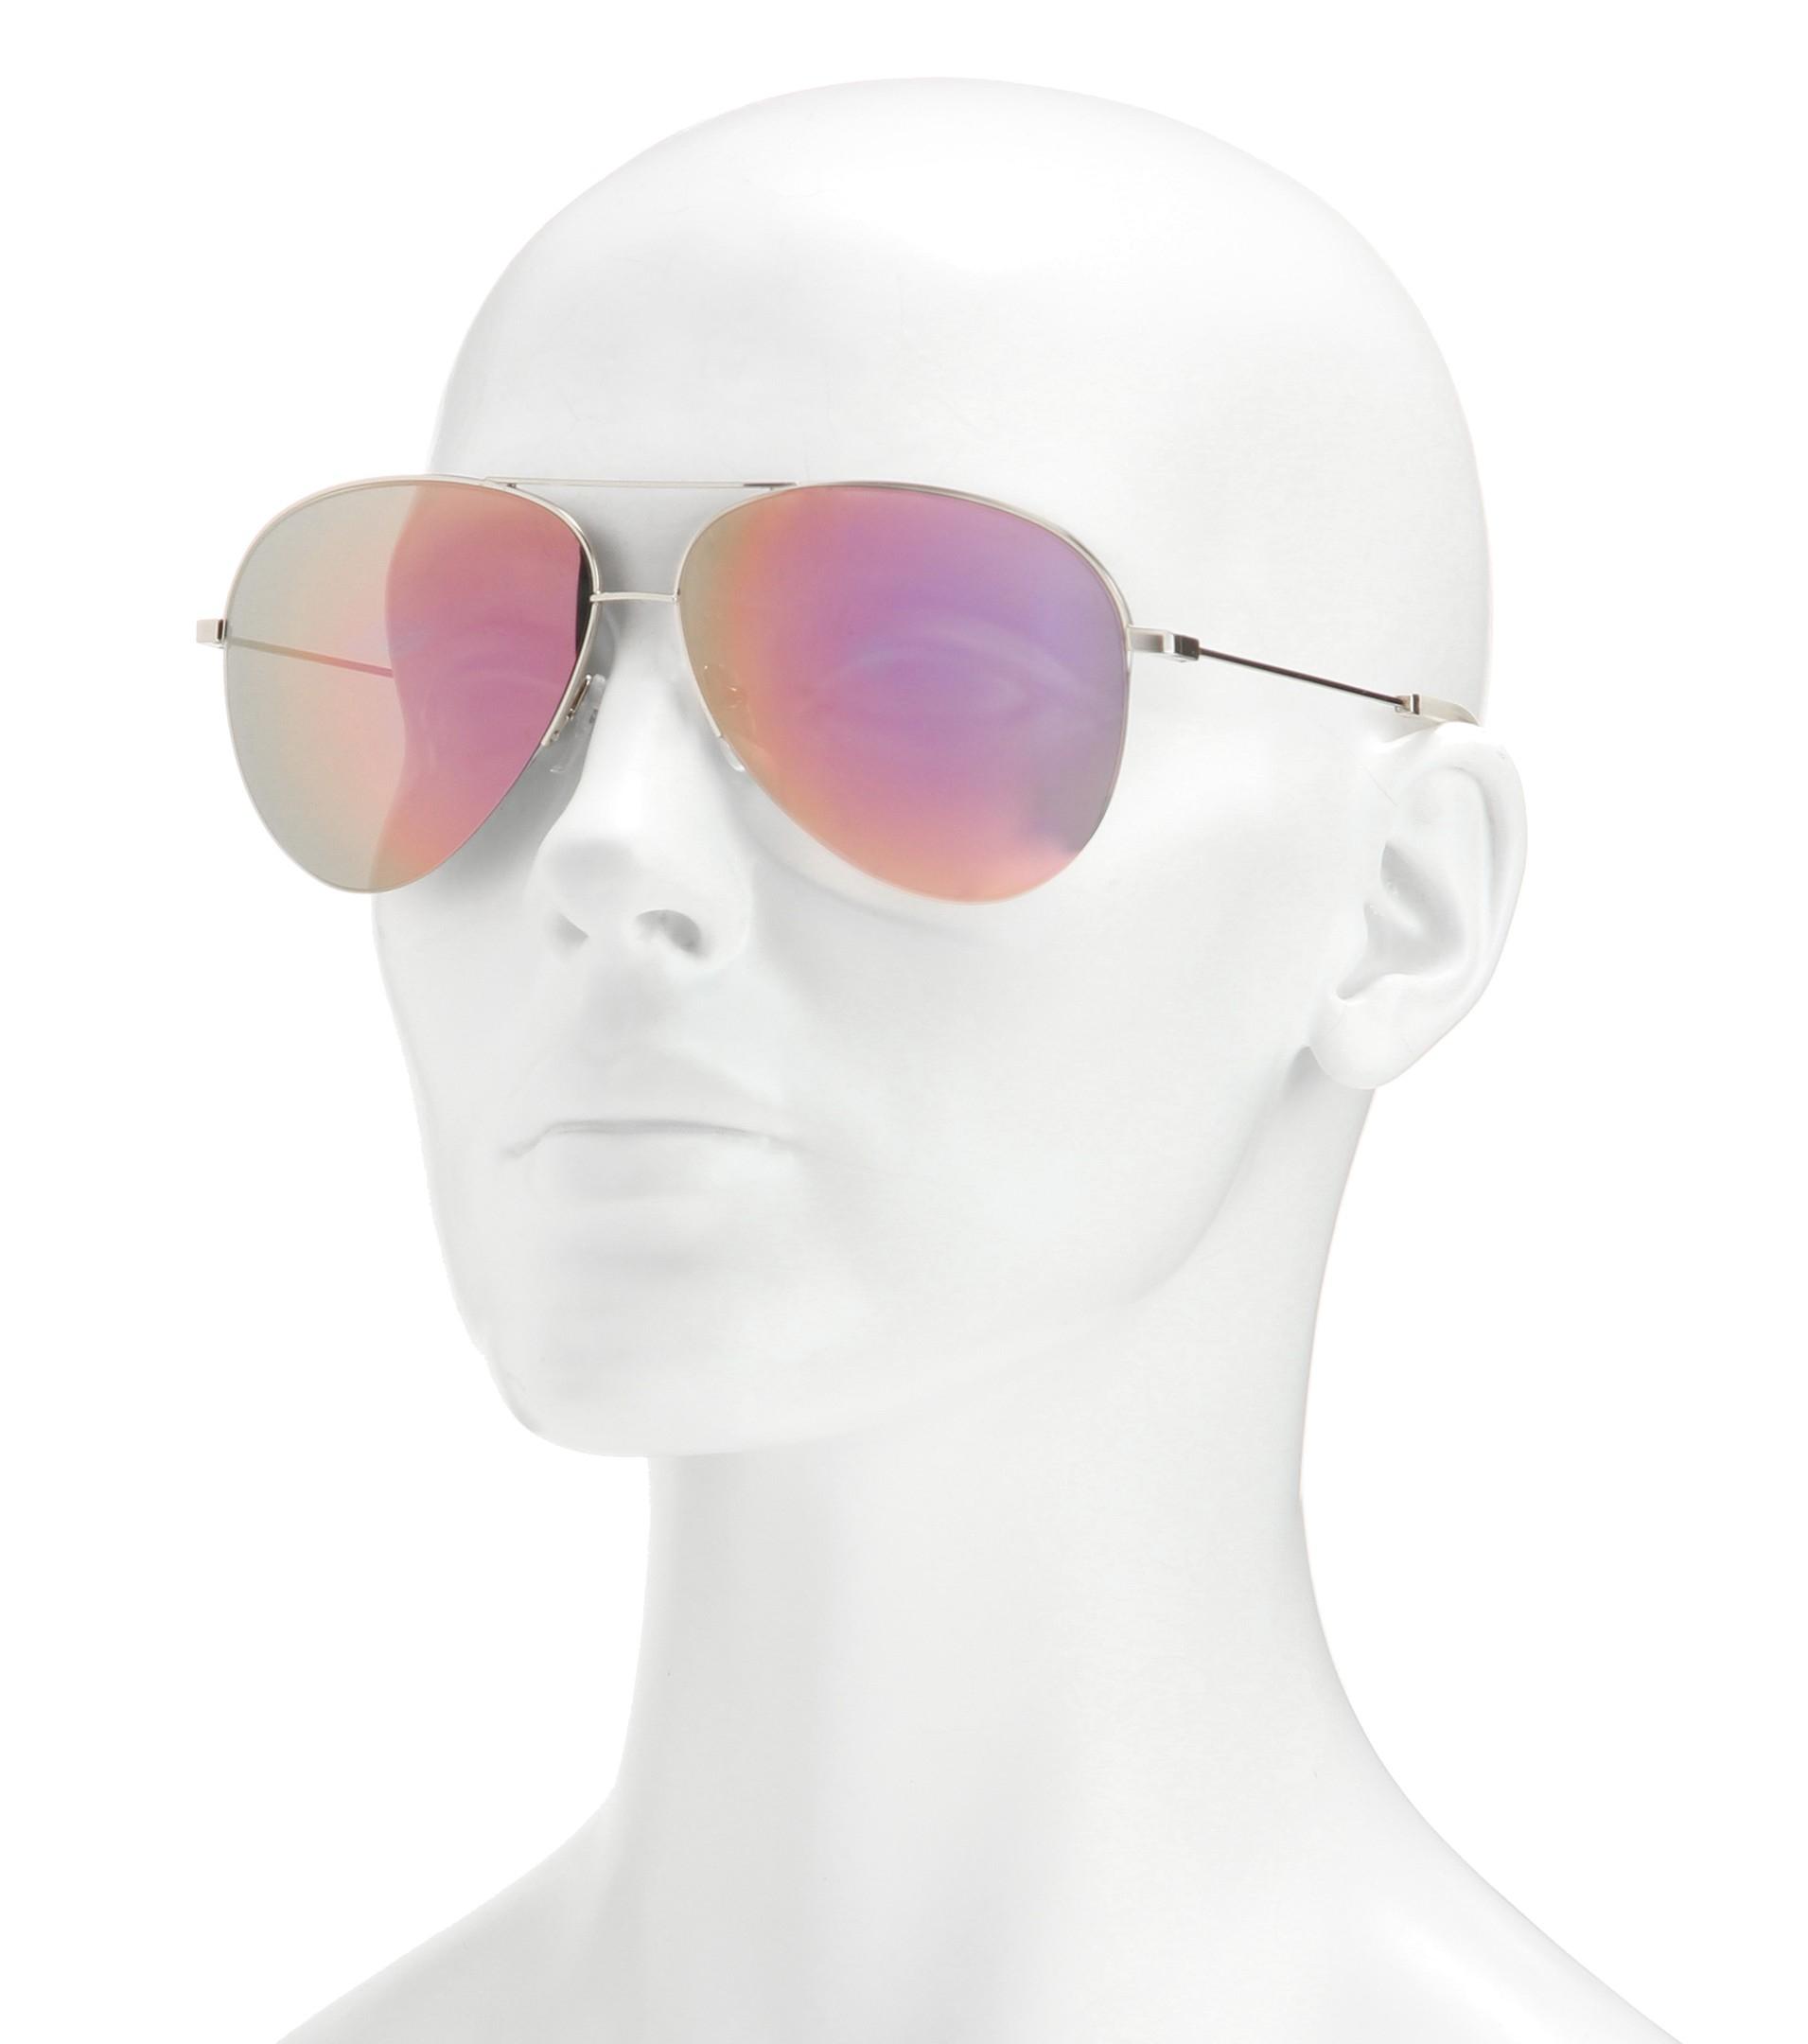 Lyst - Victoria Beckham Classic Victoria Mirrored Sunglasses in Natural 69f3567589